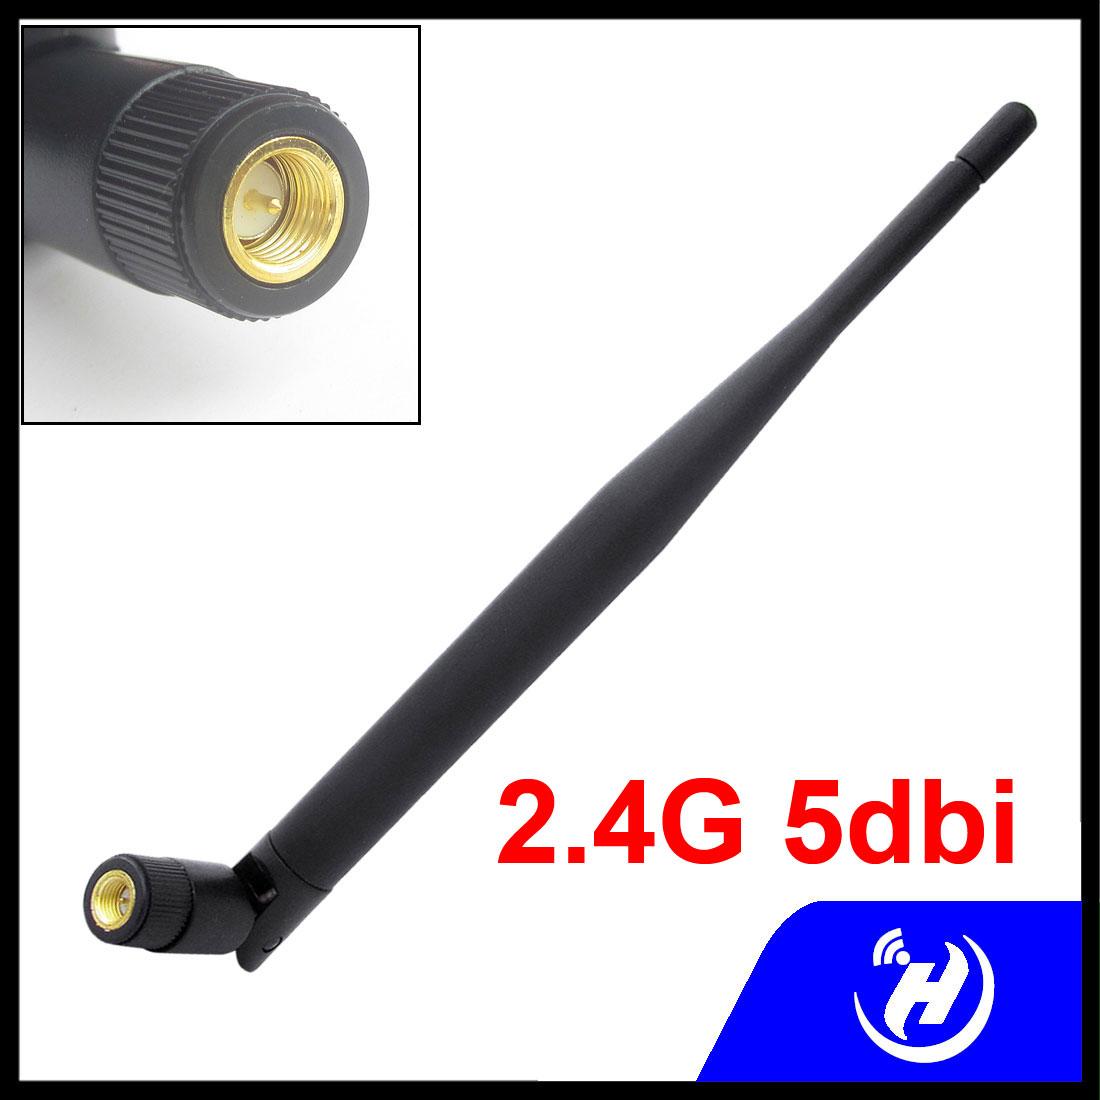 2.4g 5dbi full high gain wifi antenna rubber antenna sma internal thread needle(China (Mainland))